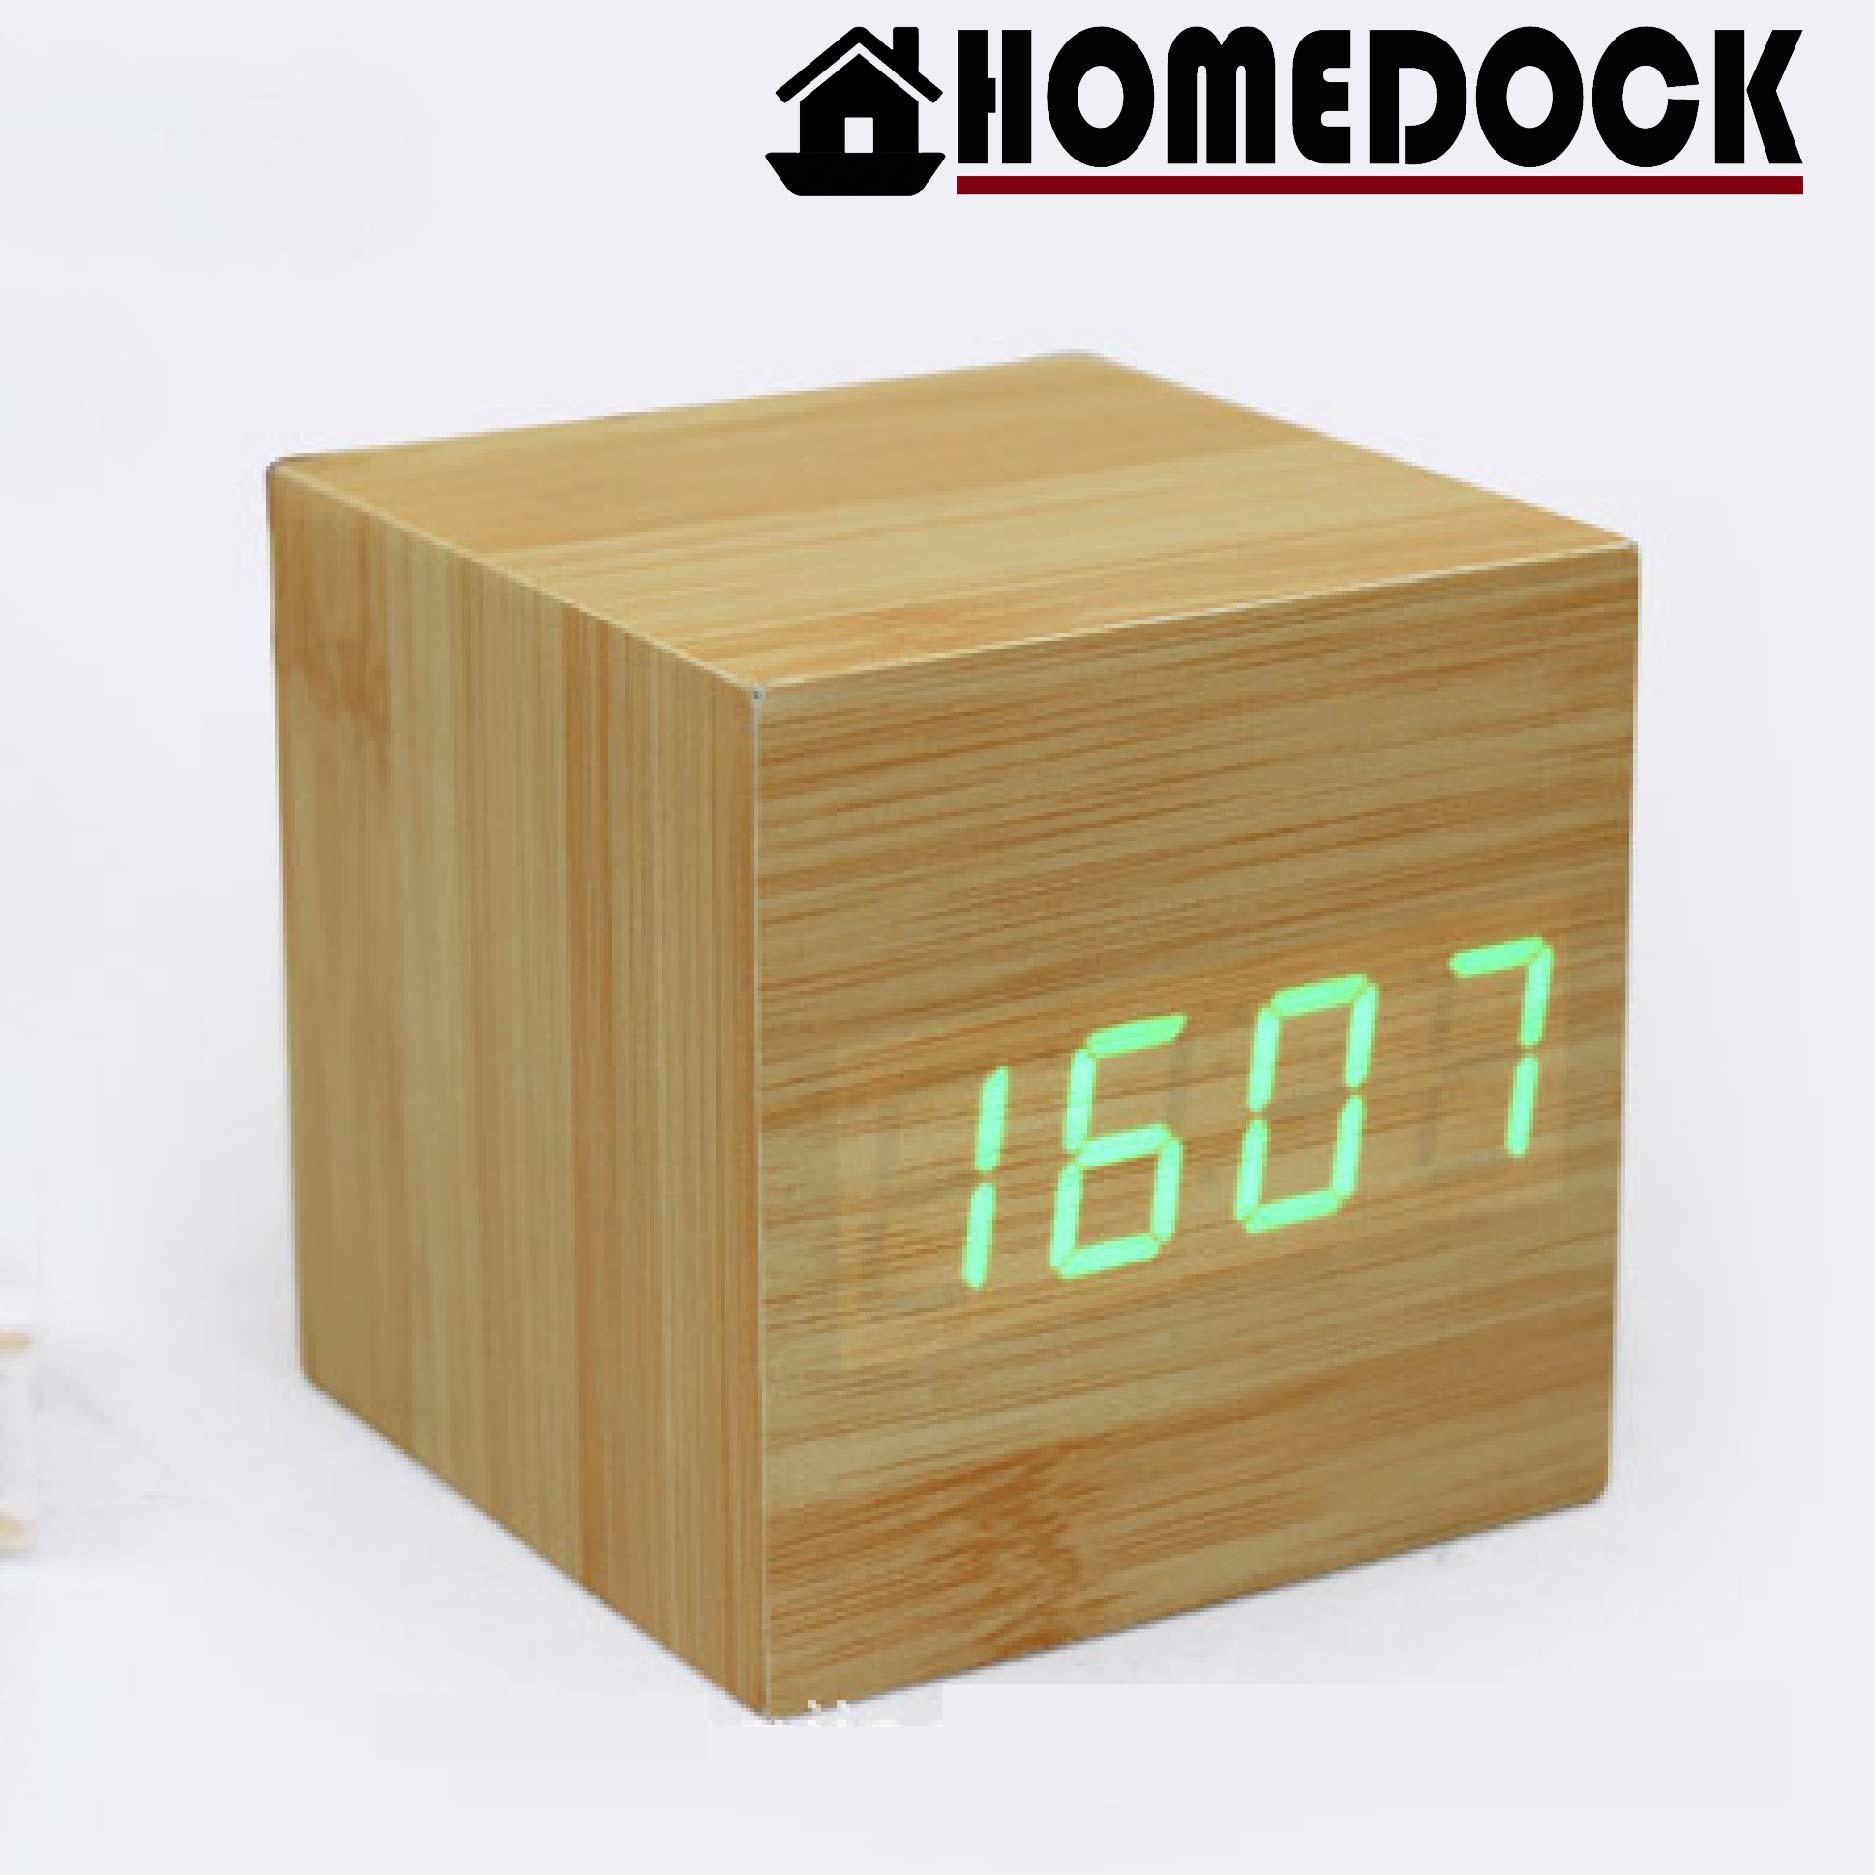 HOMEDOCK-LED 方形聲控木質感鬧鐘 附溫度計時鐘/錶/桌鐘/電子鐘/LED木頭鐘/